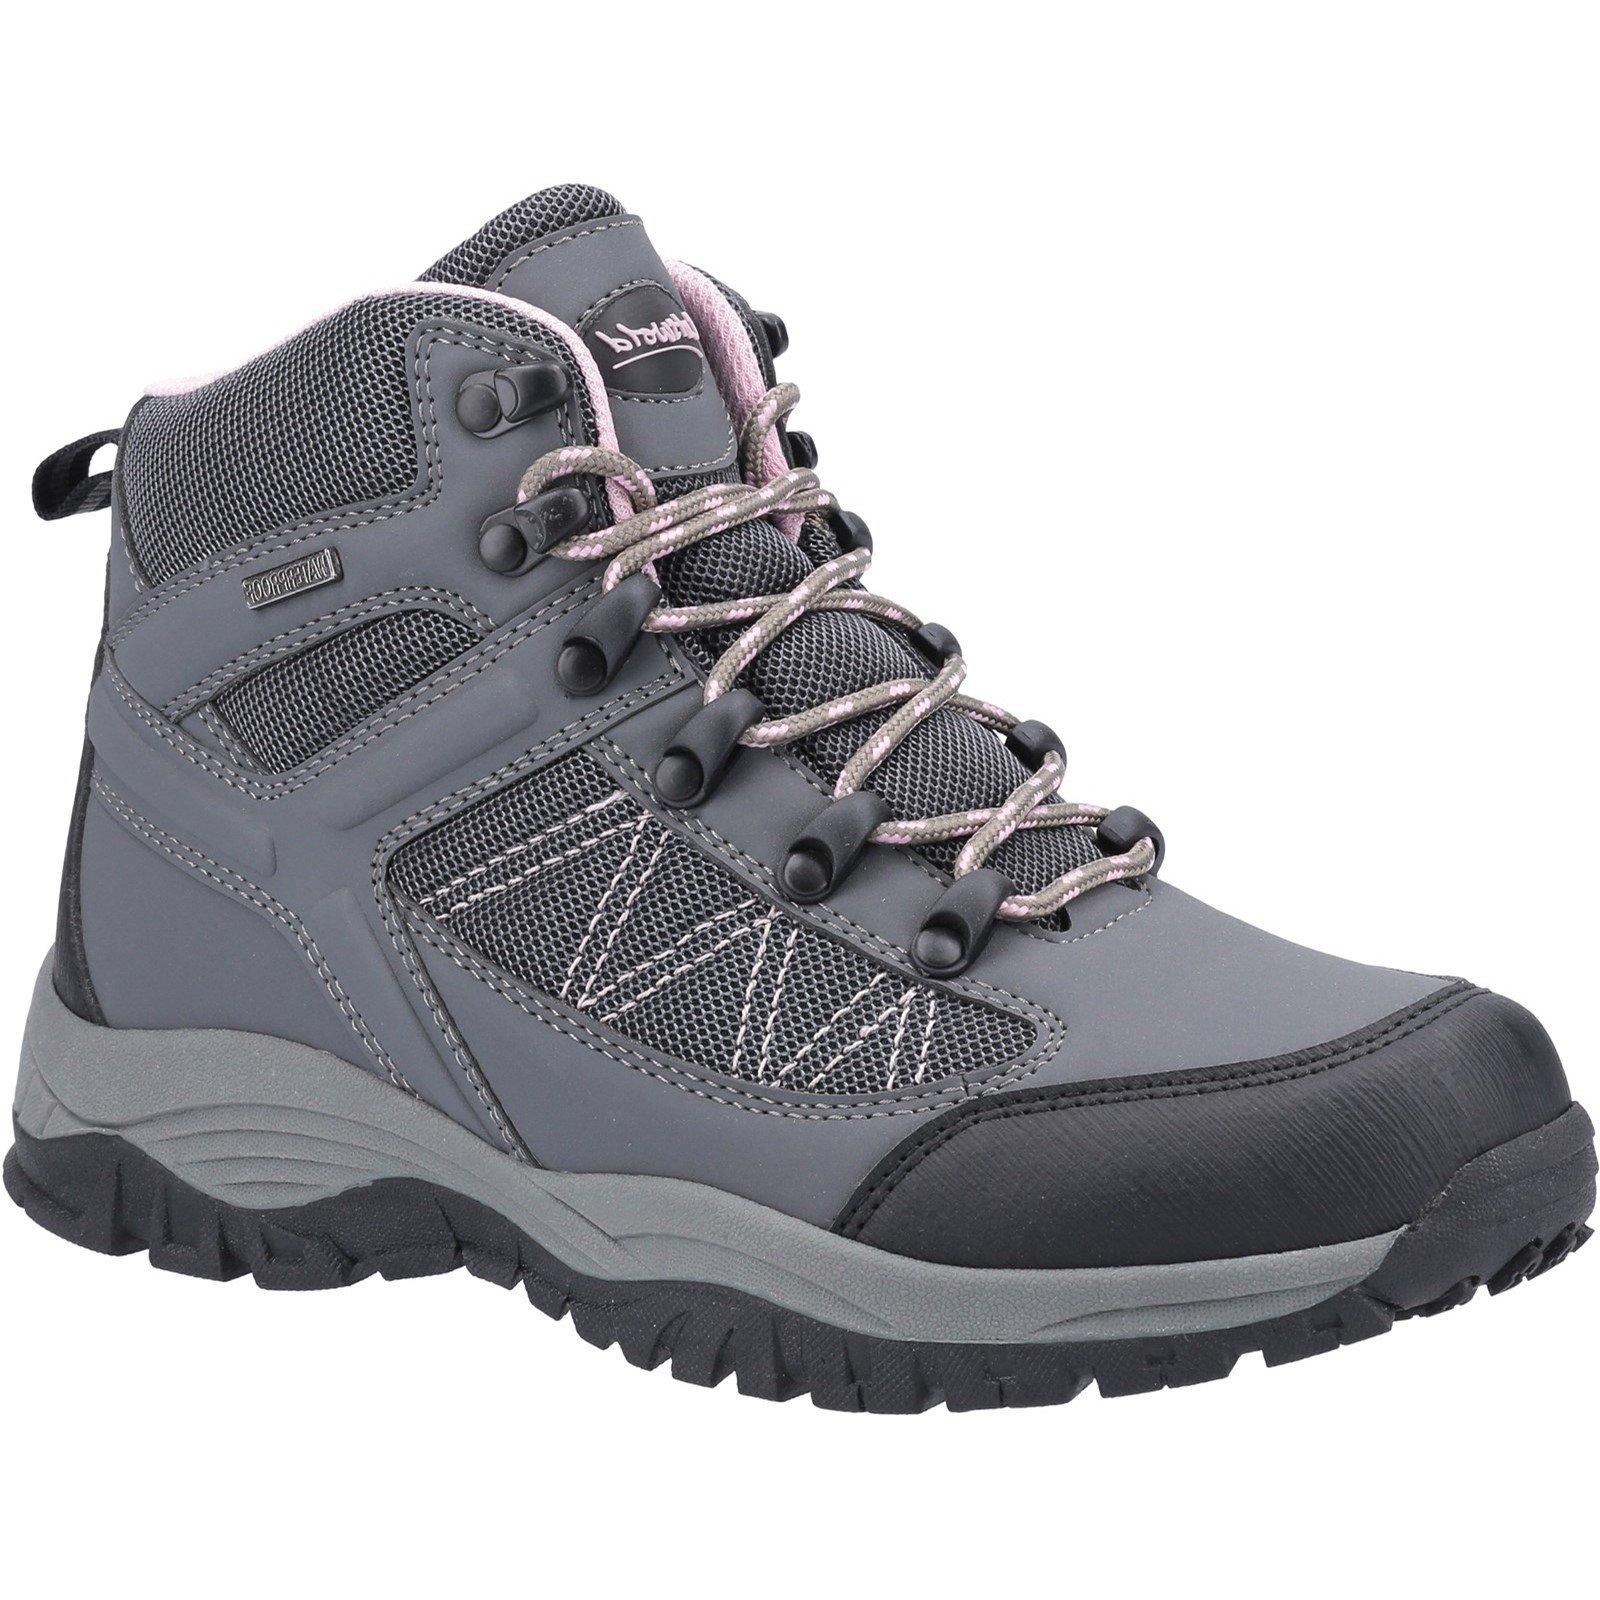 Cotswold Women's Maisemore Hiking Boot Grey 32986 - Grey 4